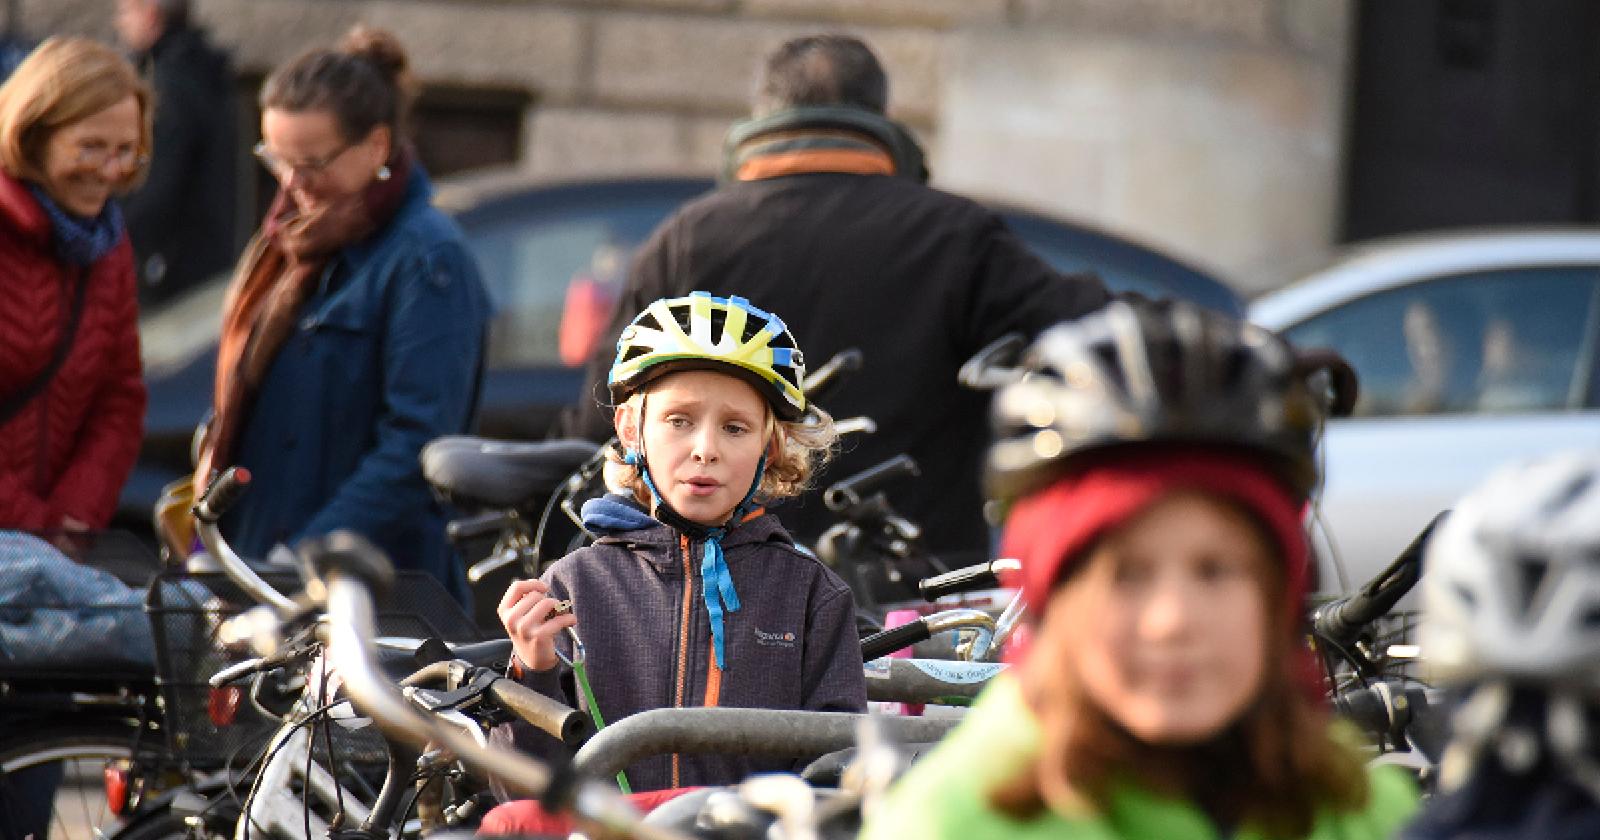 frissewind-foto-reportage27-fiets